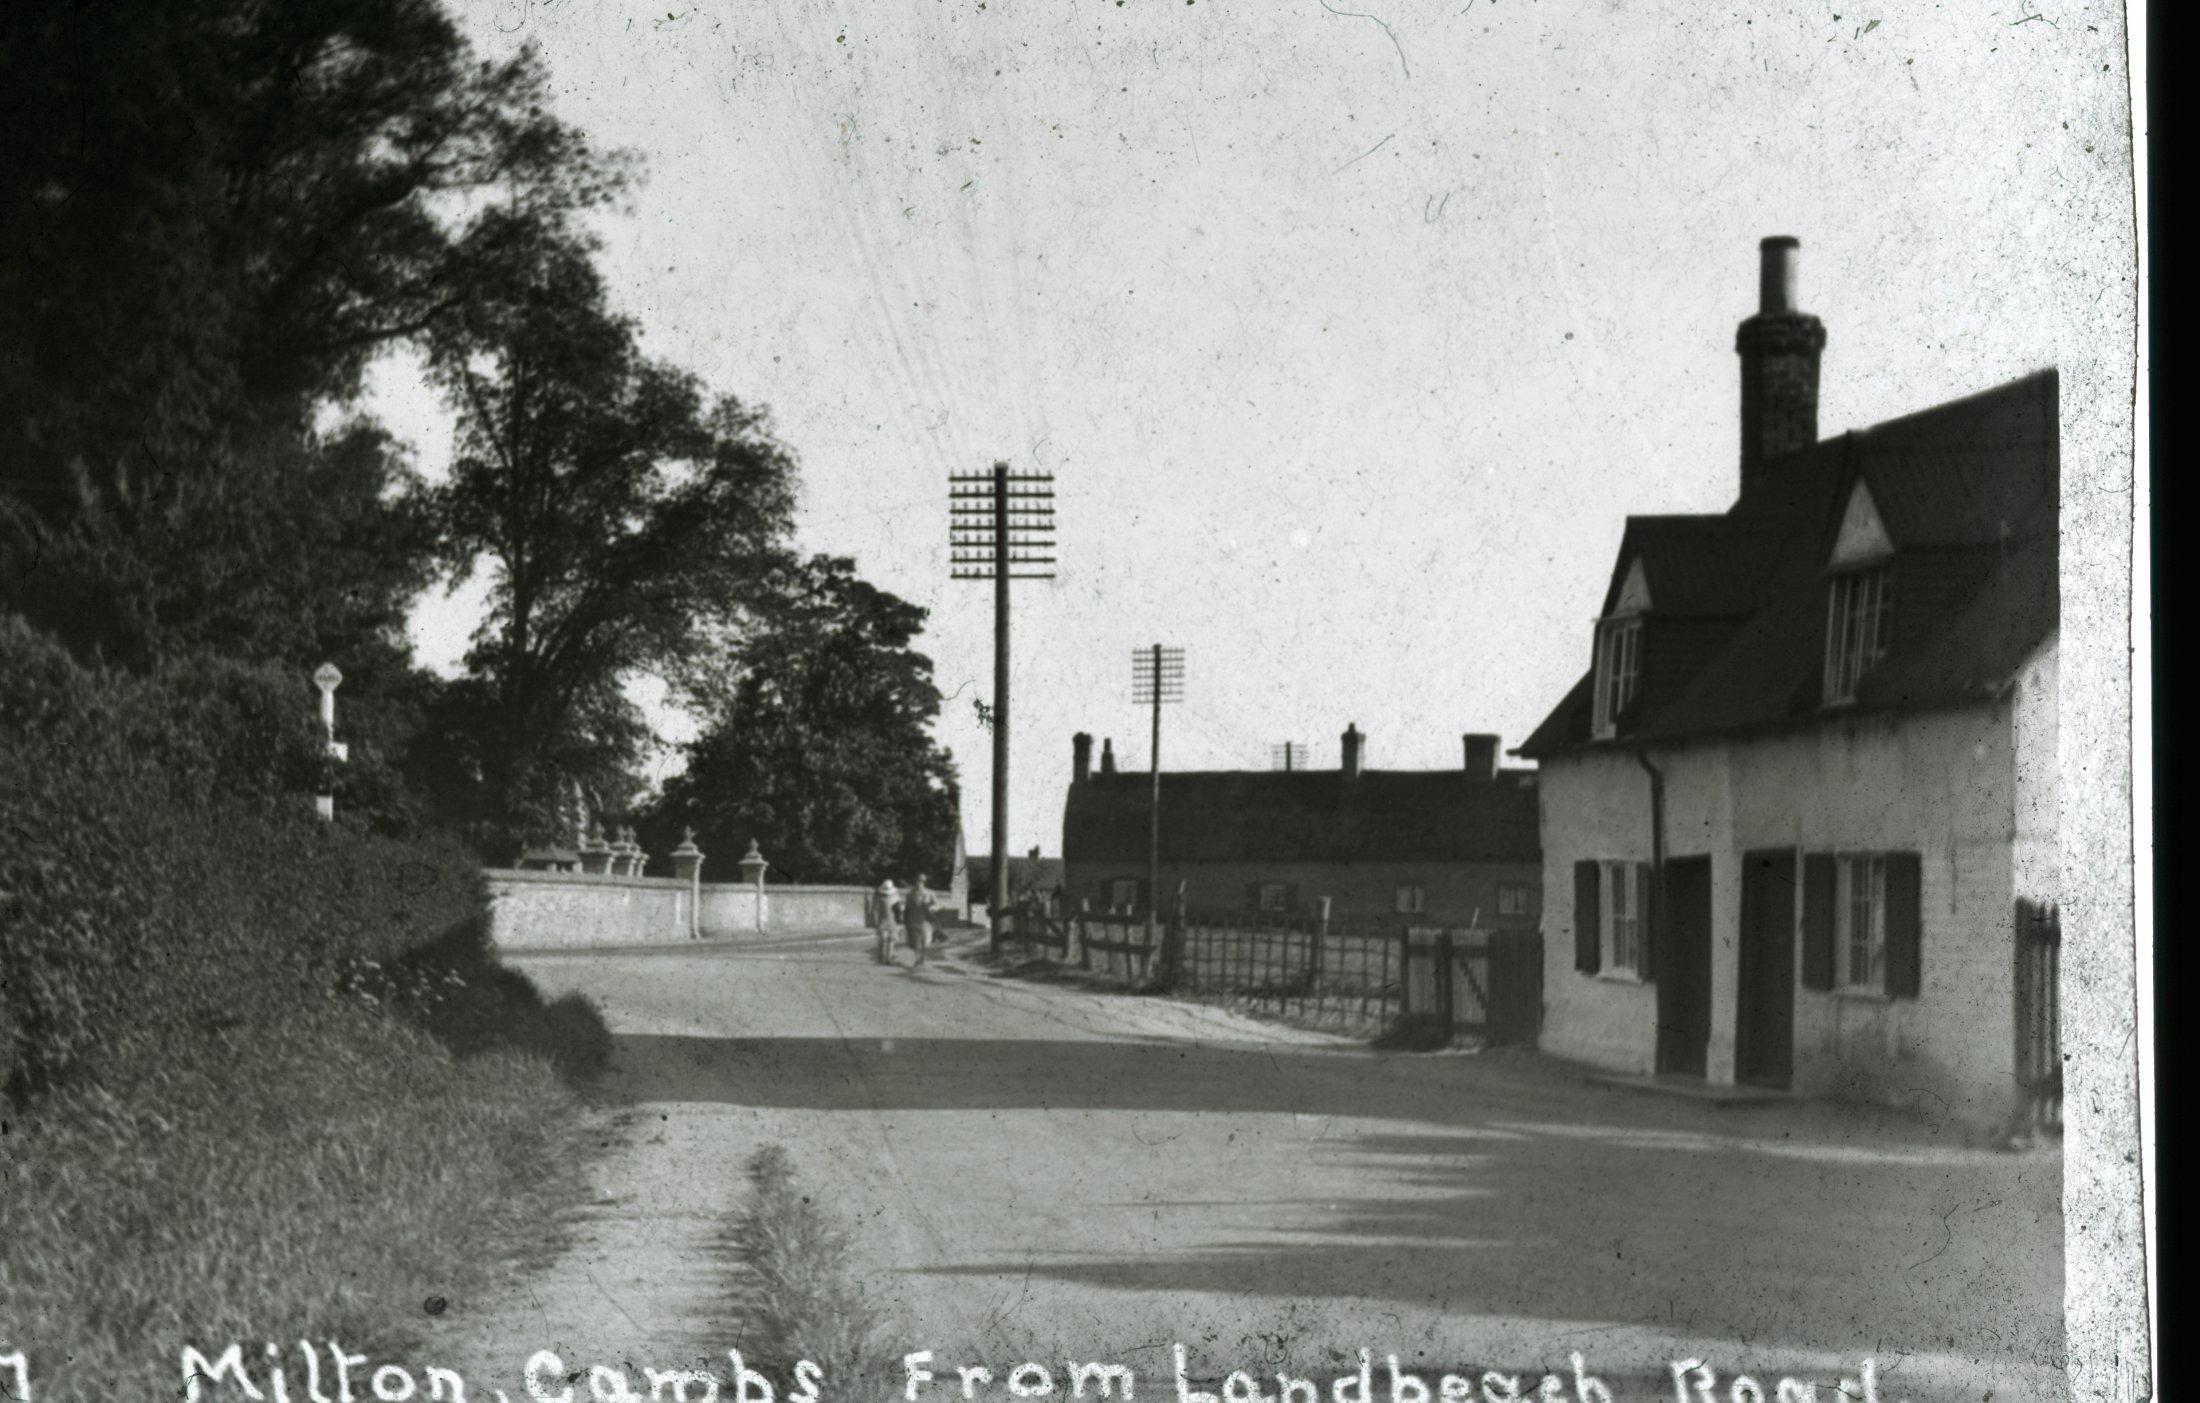 Landbeach Road